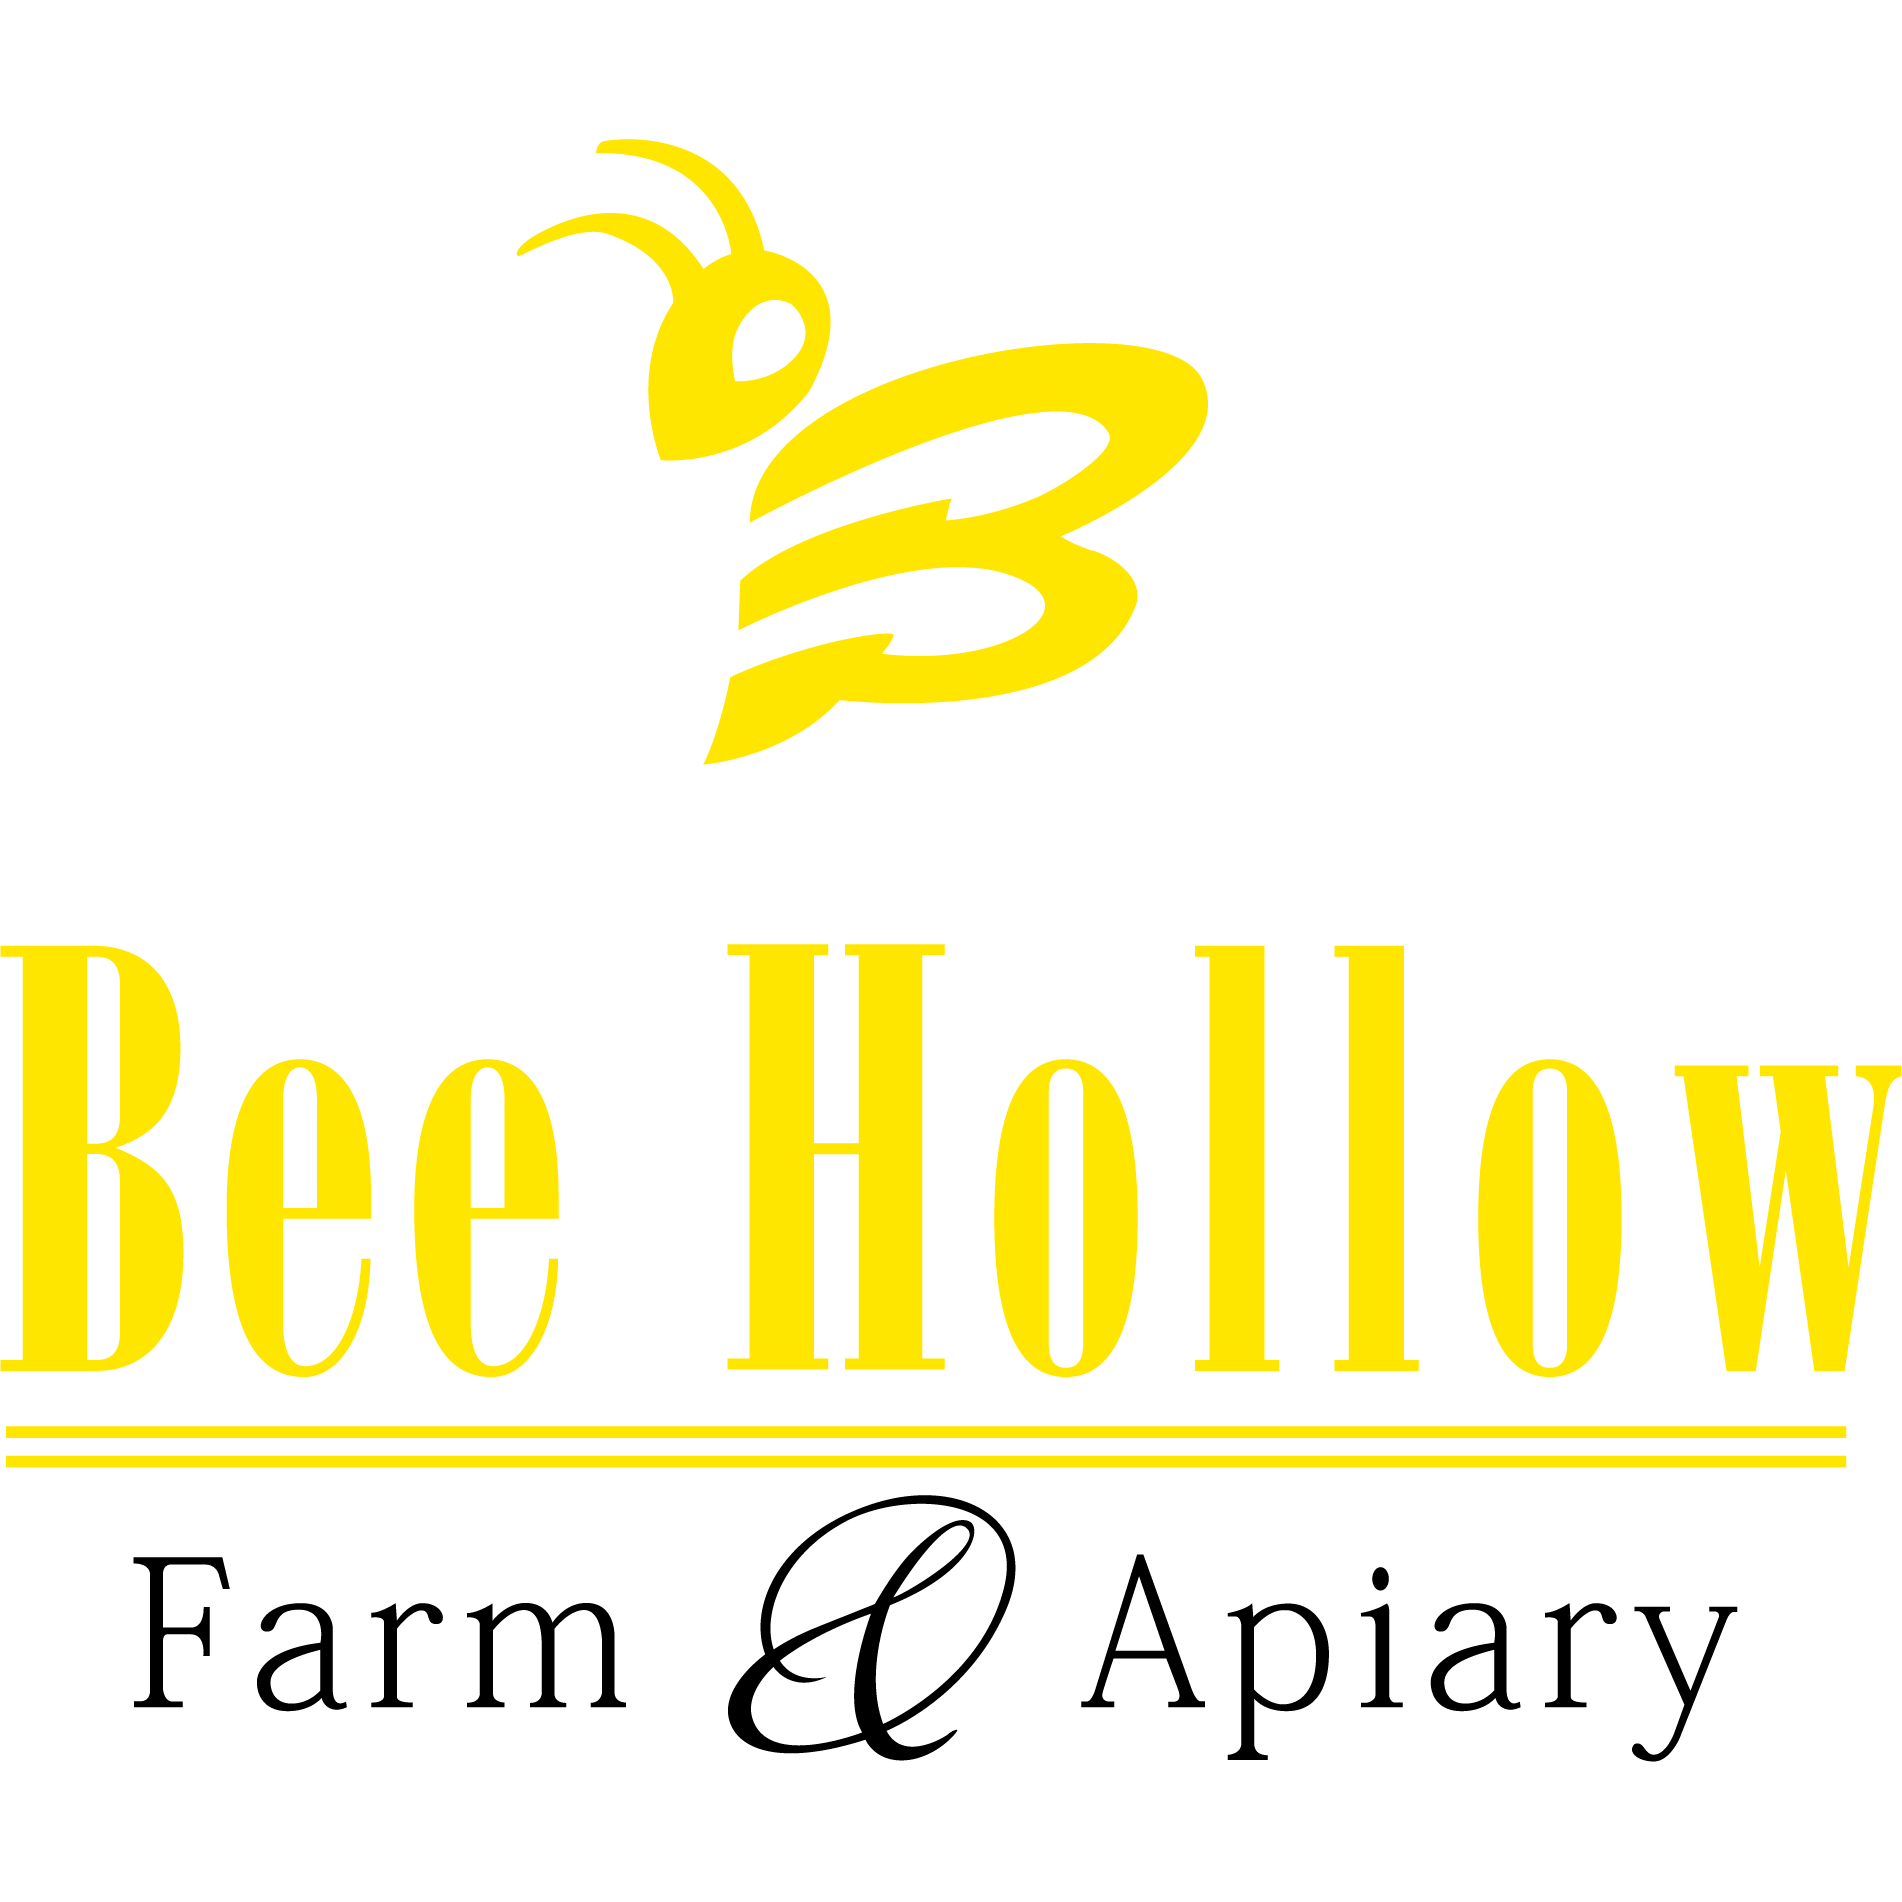 Bee Hollow Farm